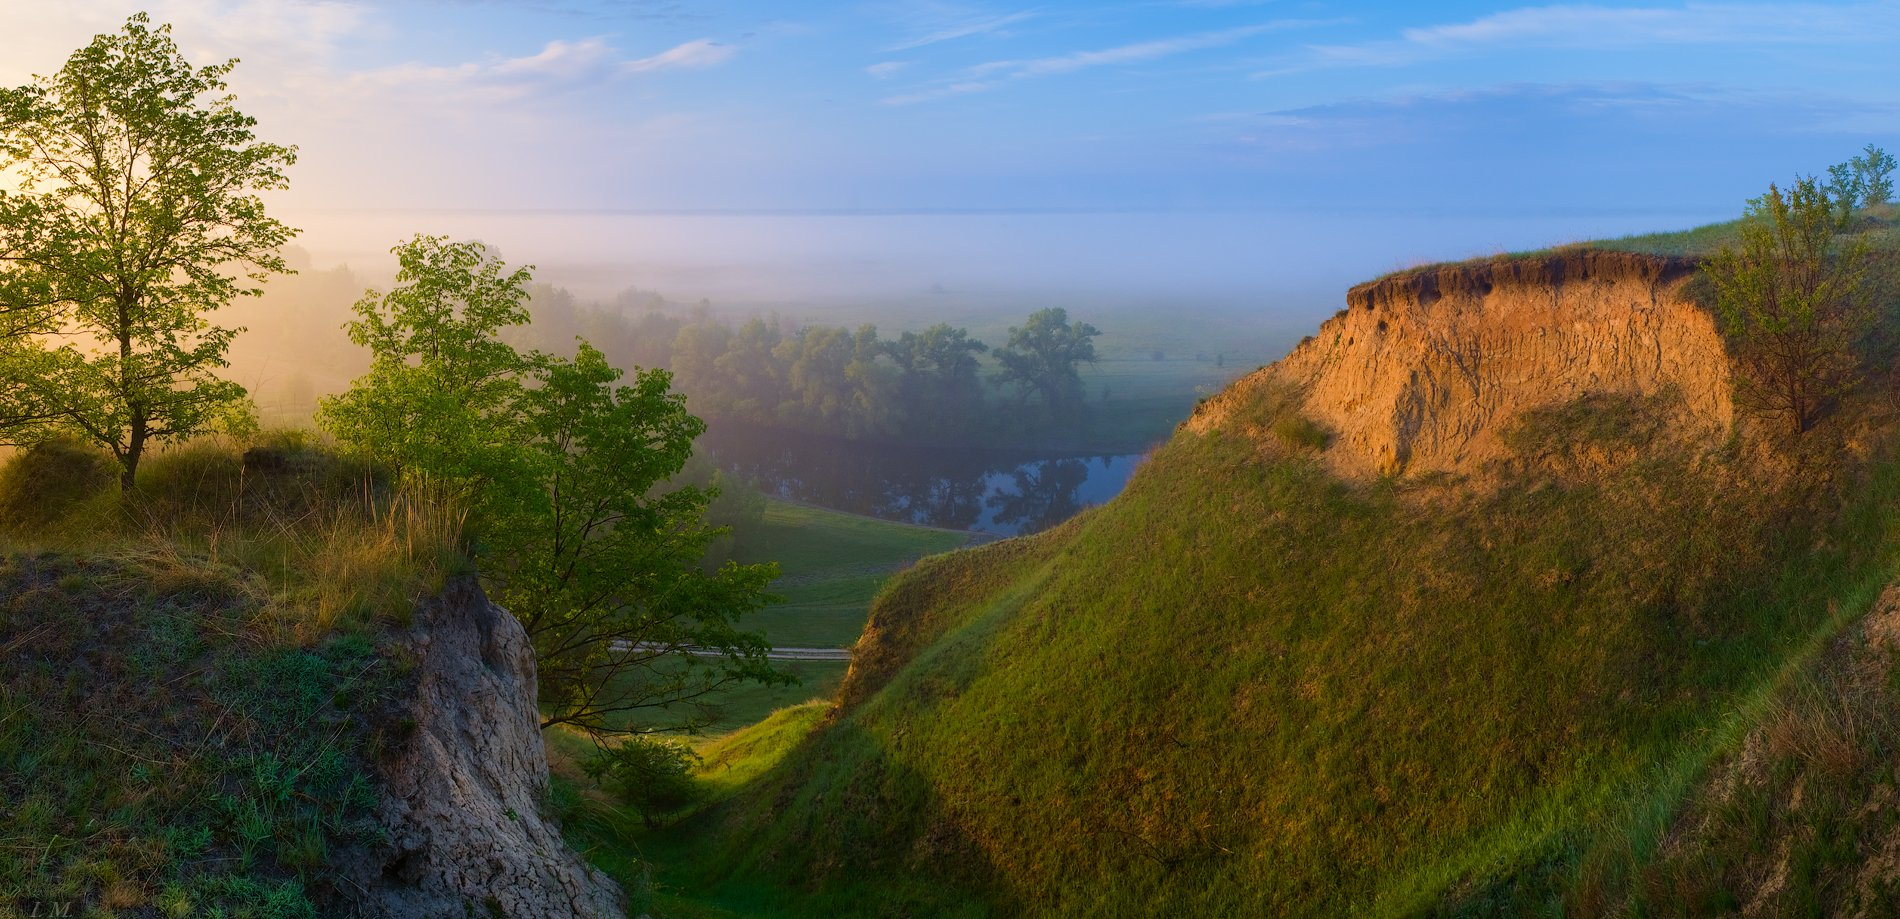 Утро, туман, река, Псел, весна, май, рассвет, панорама, речные террасы, sunrise, may, spring, panorama, Psel, river, fog, light, wide angle, landscape photography, terraces, view, hills, morning, , I'M